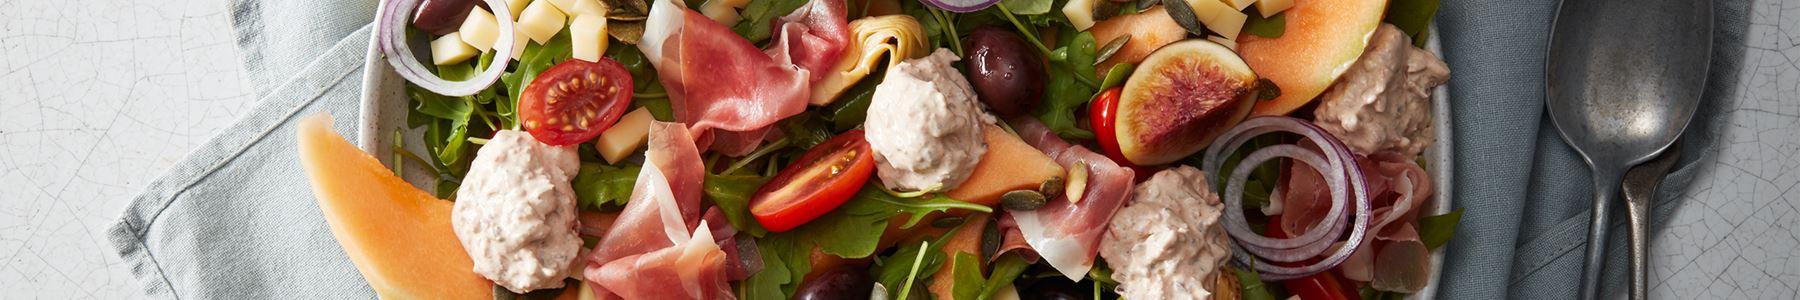 Fikon + Lunch + Sallad